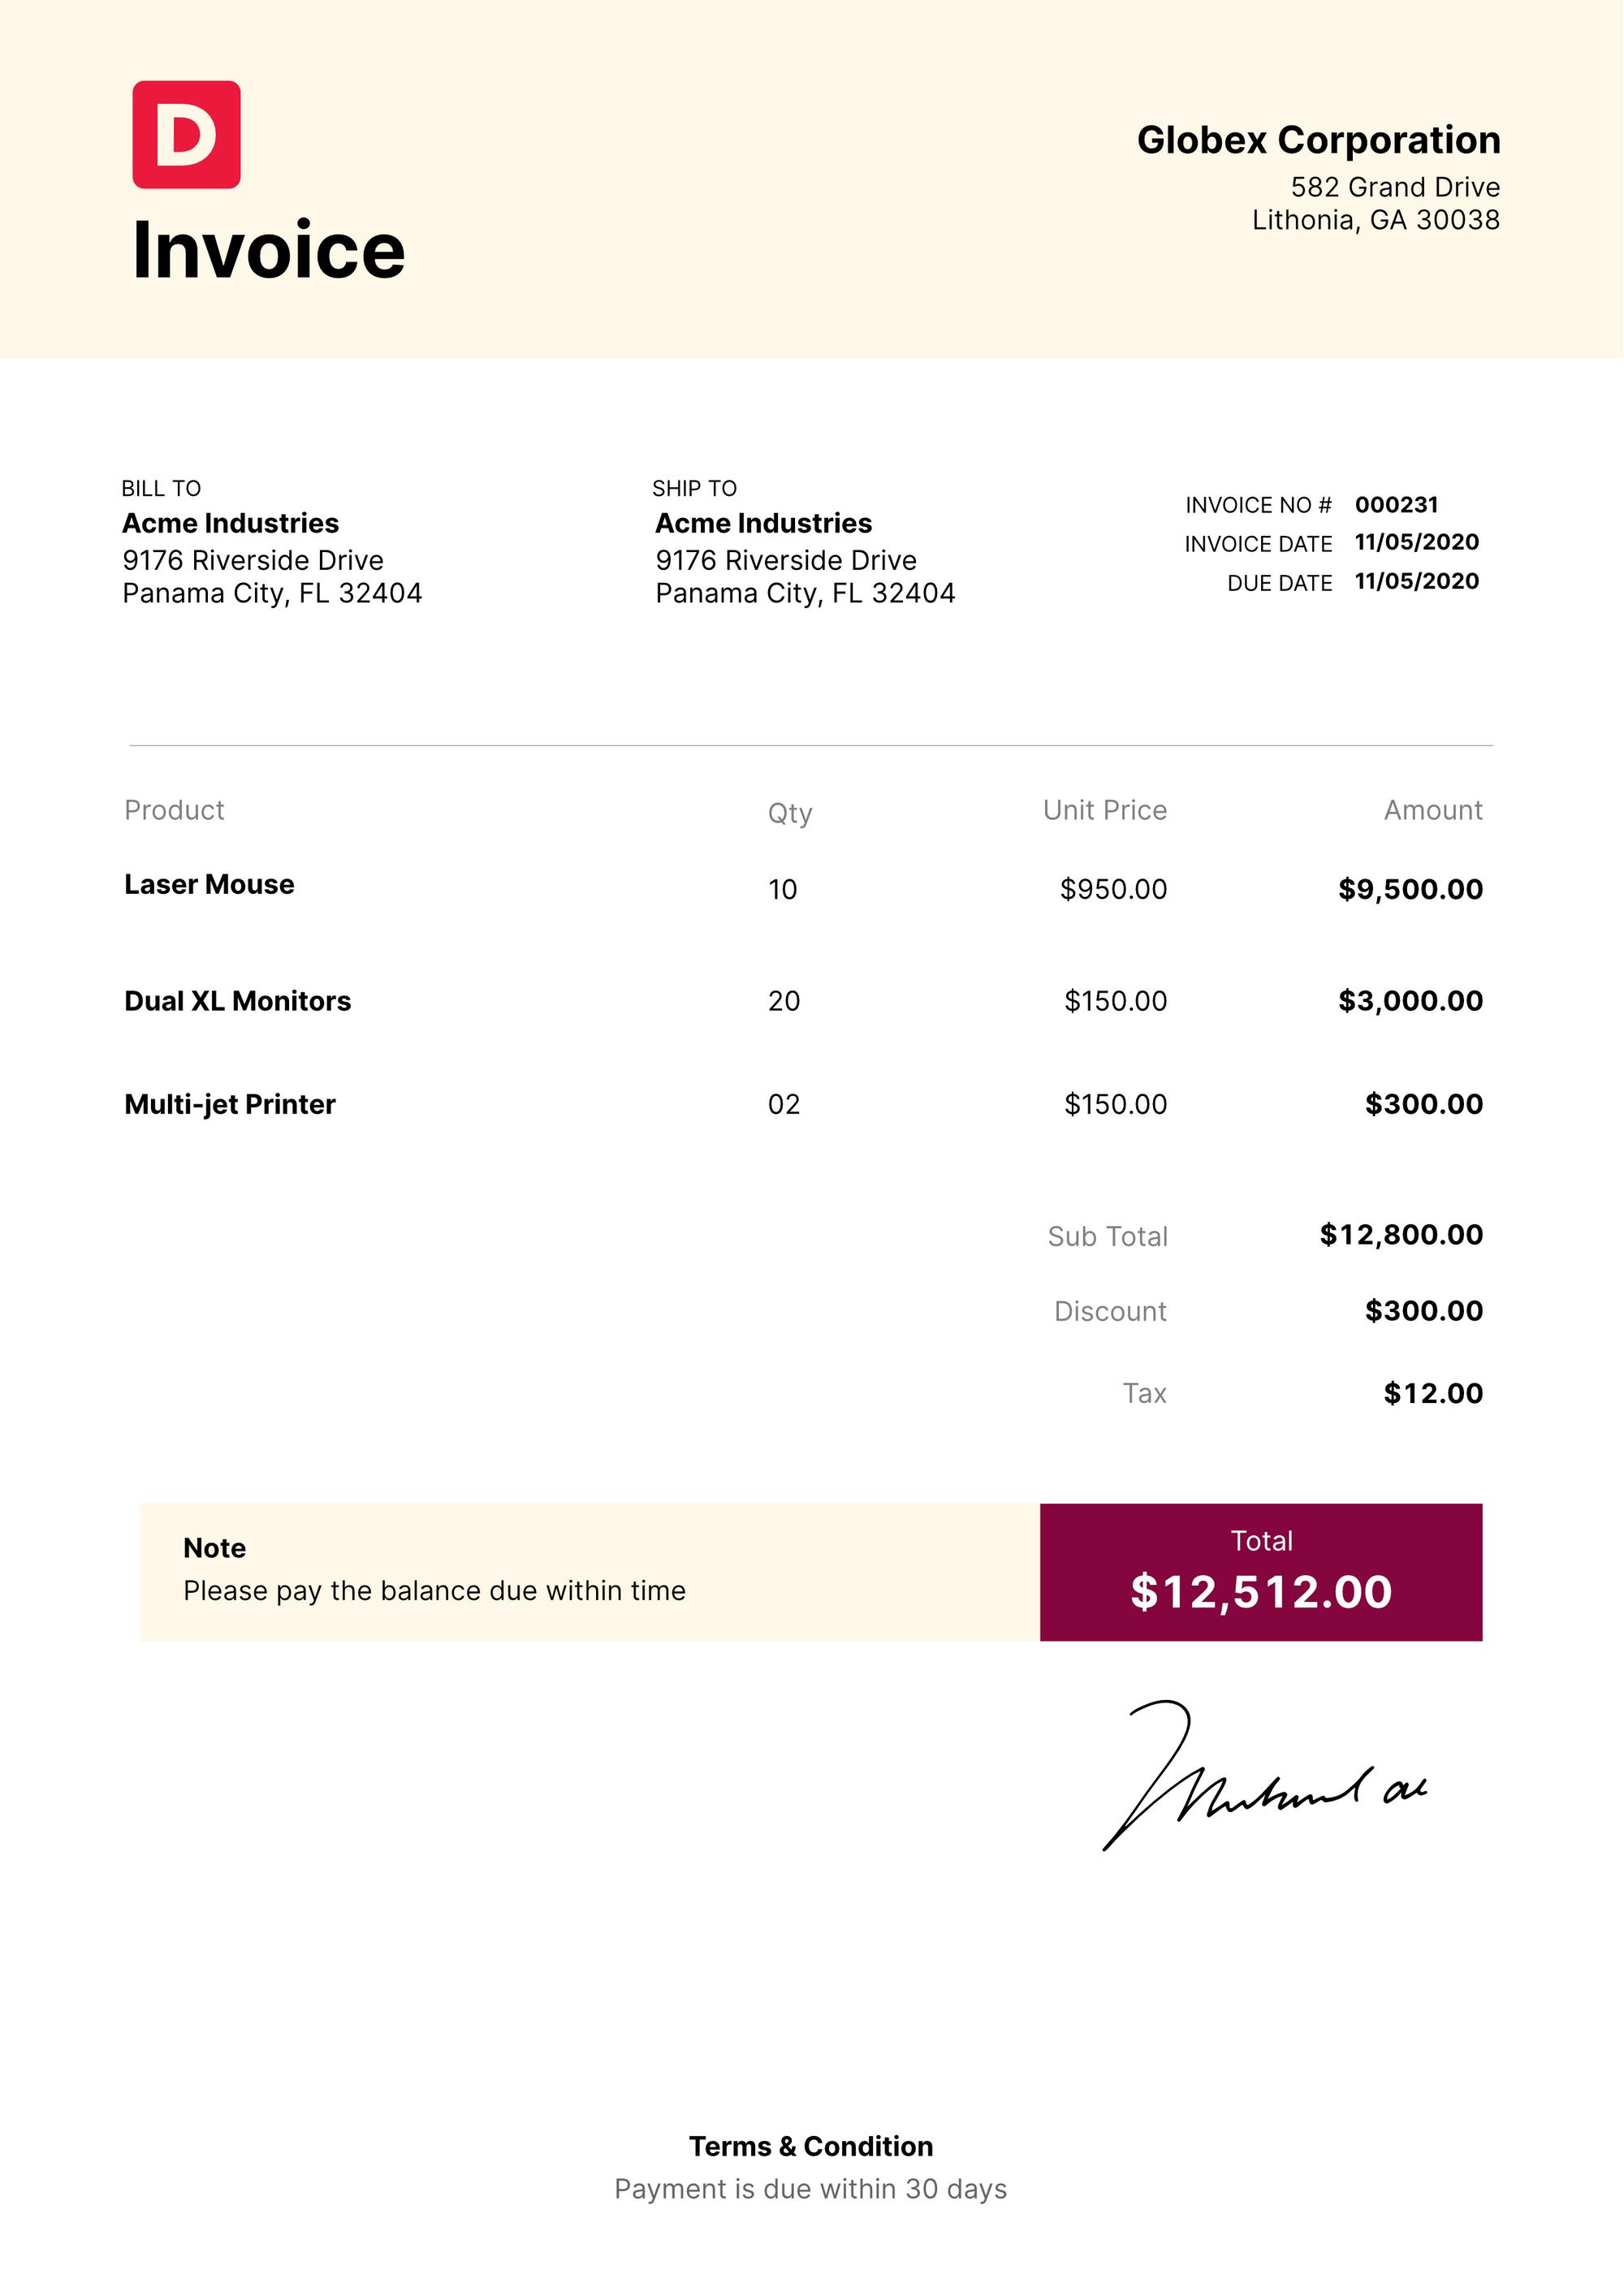 Standard Sales Invoice